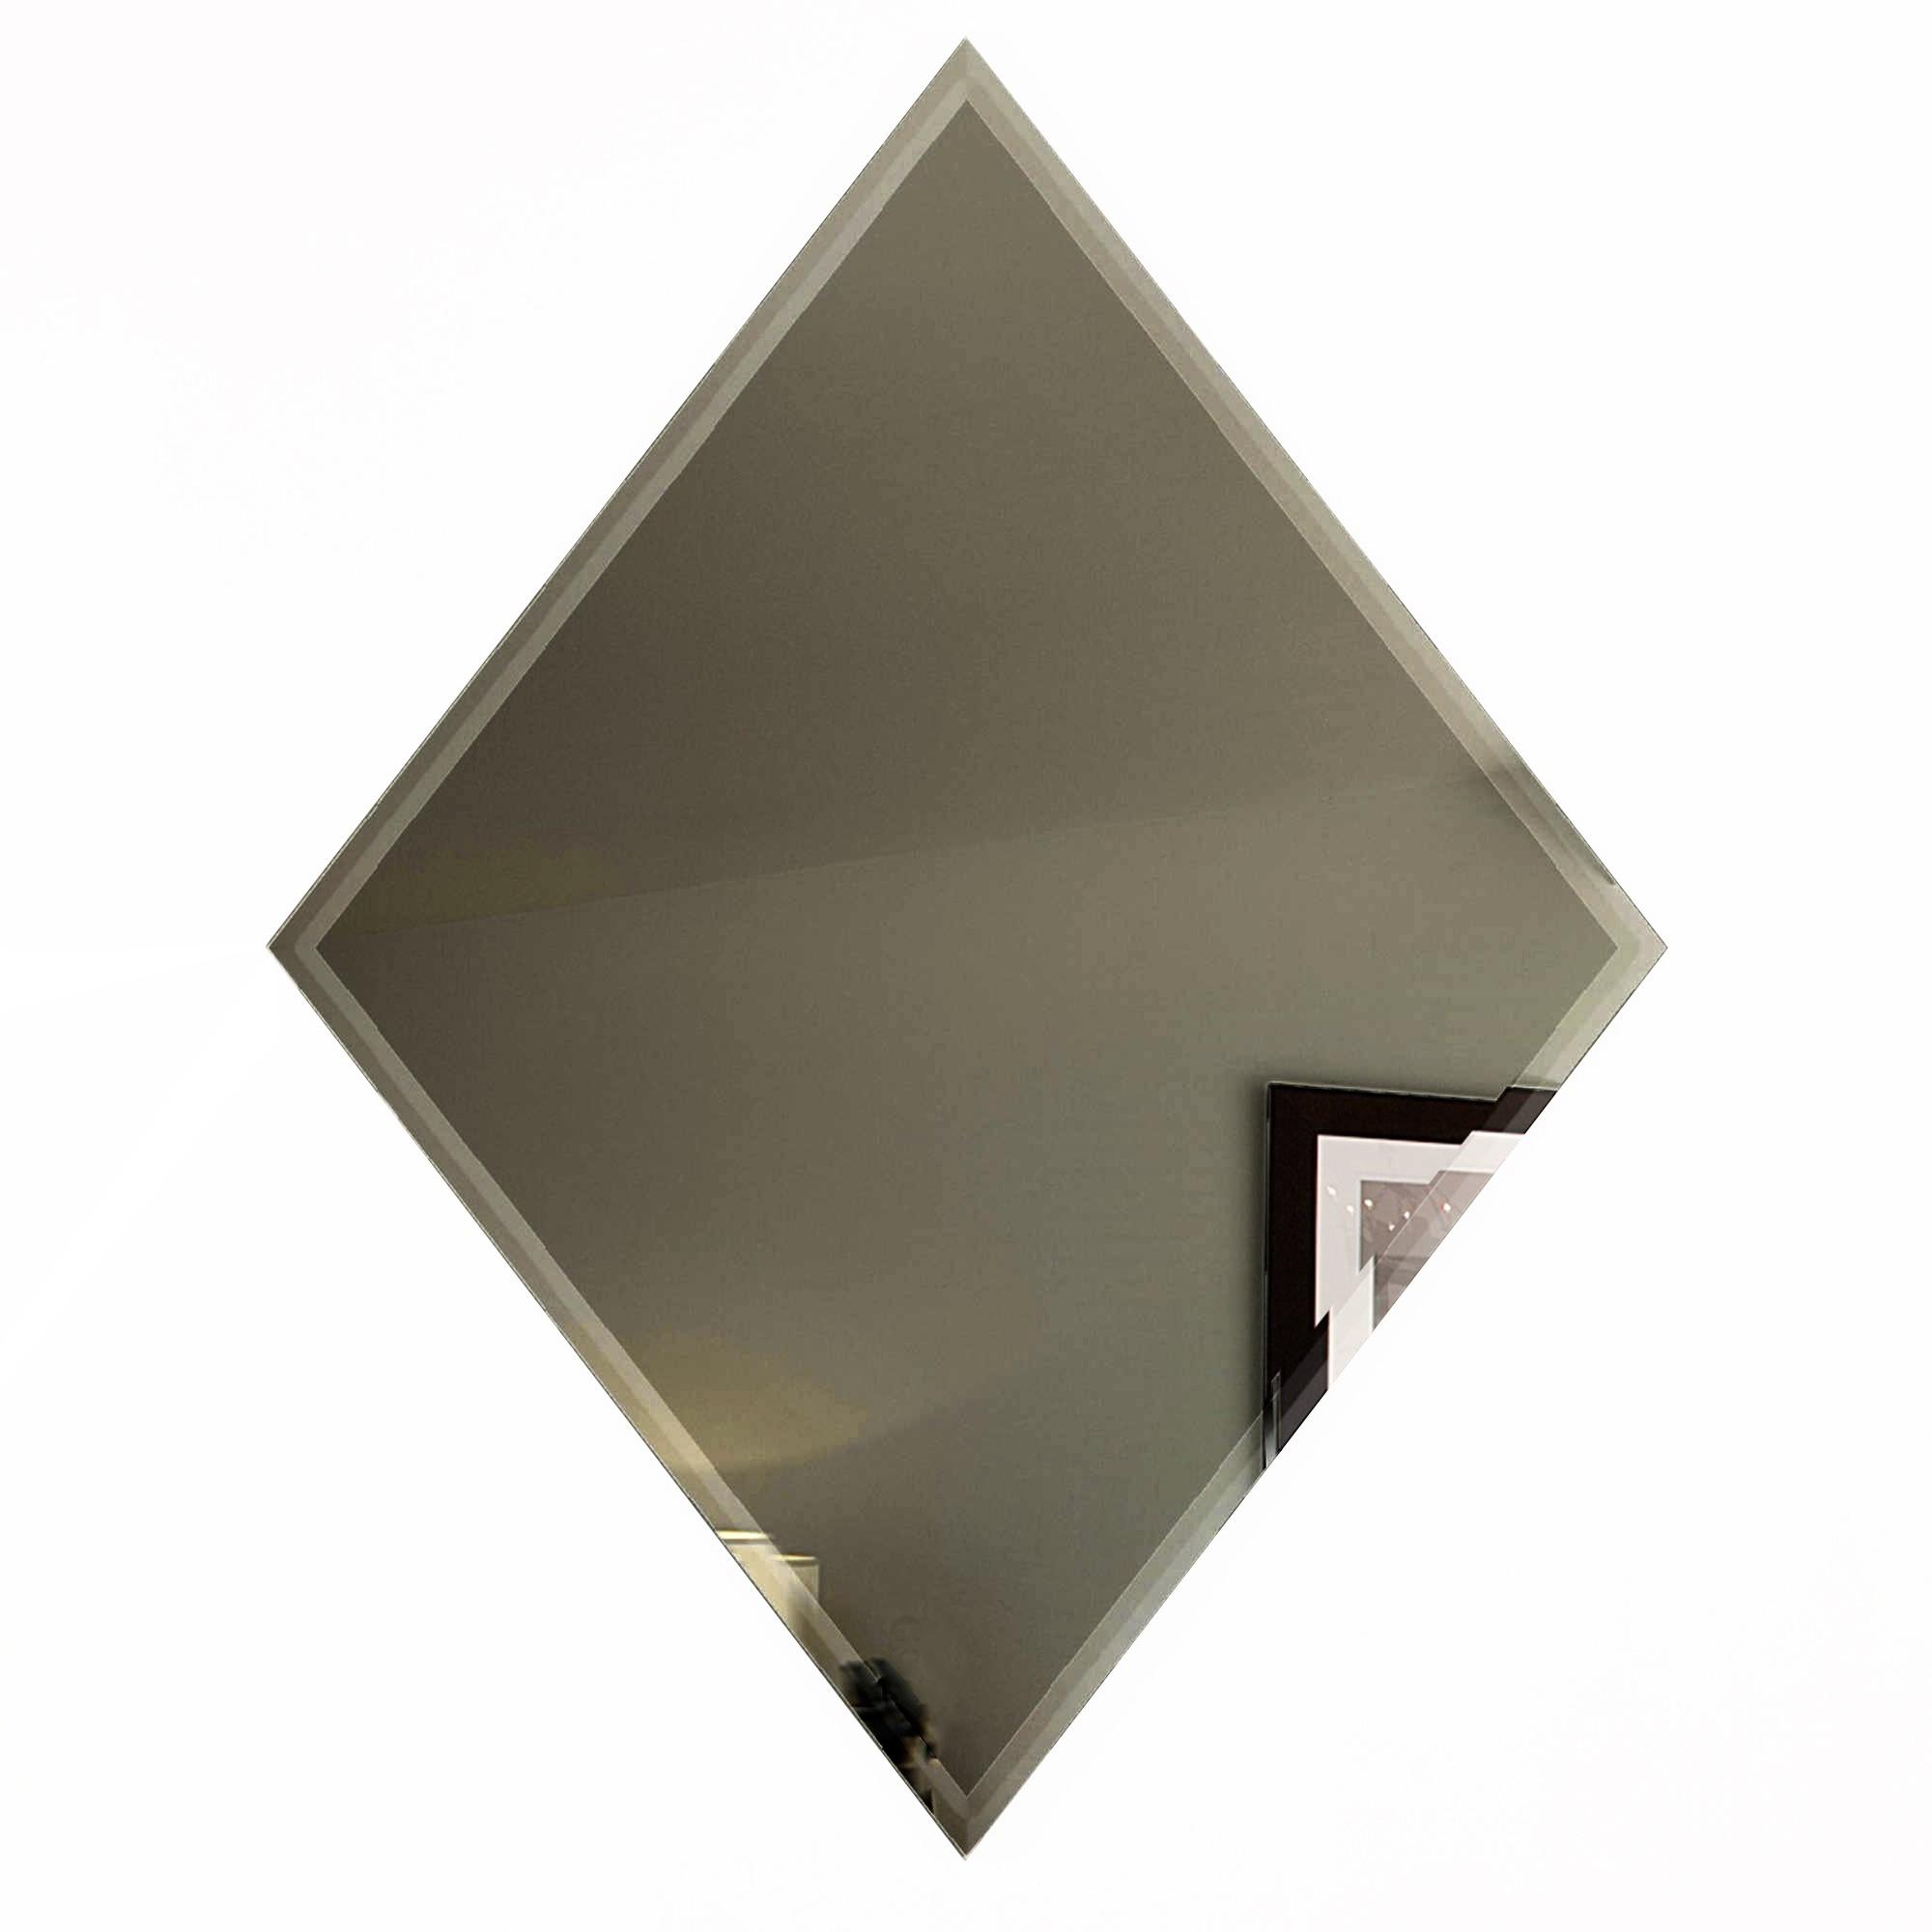 "Reflections 6"" x 8"" Glossy Gold Mirror Diamond Backsplash Wall Tile"